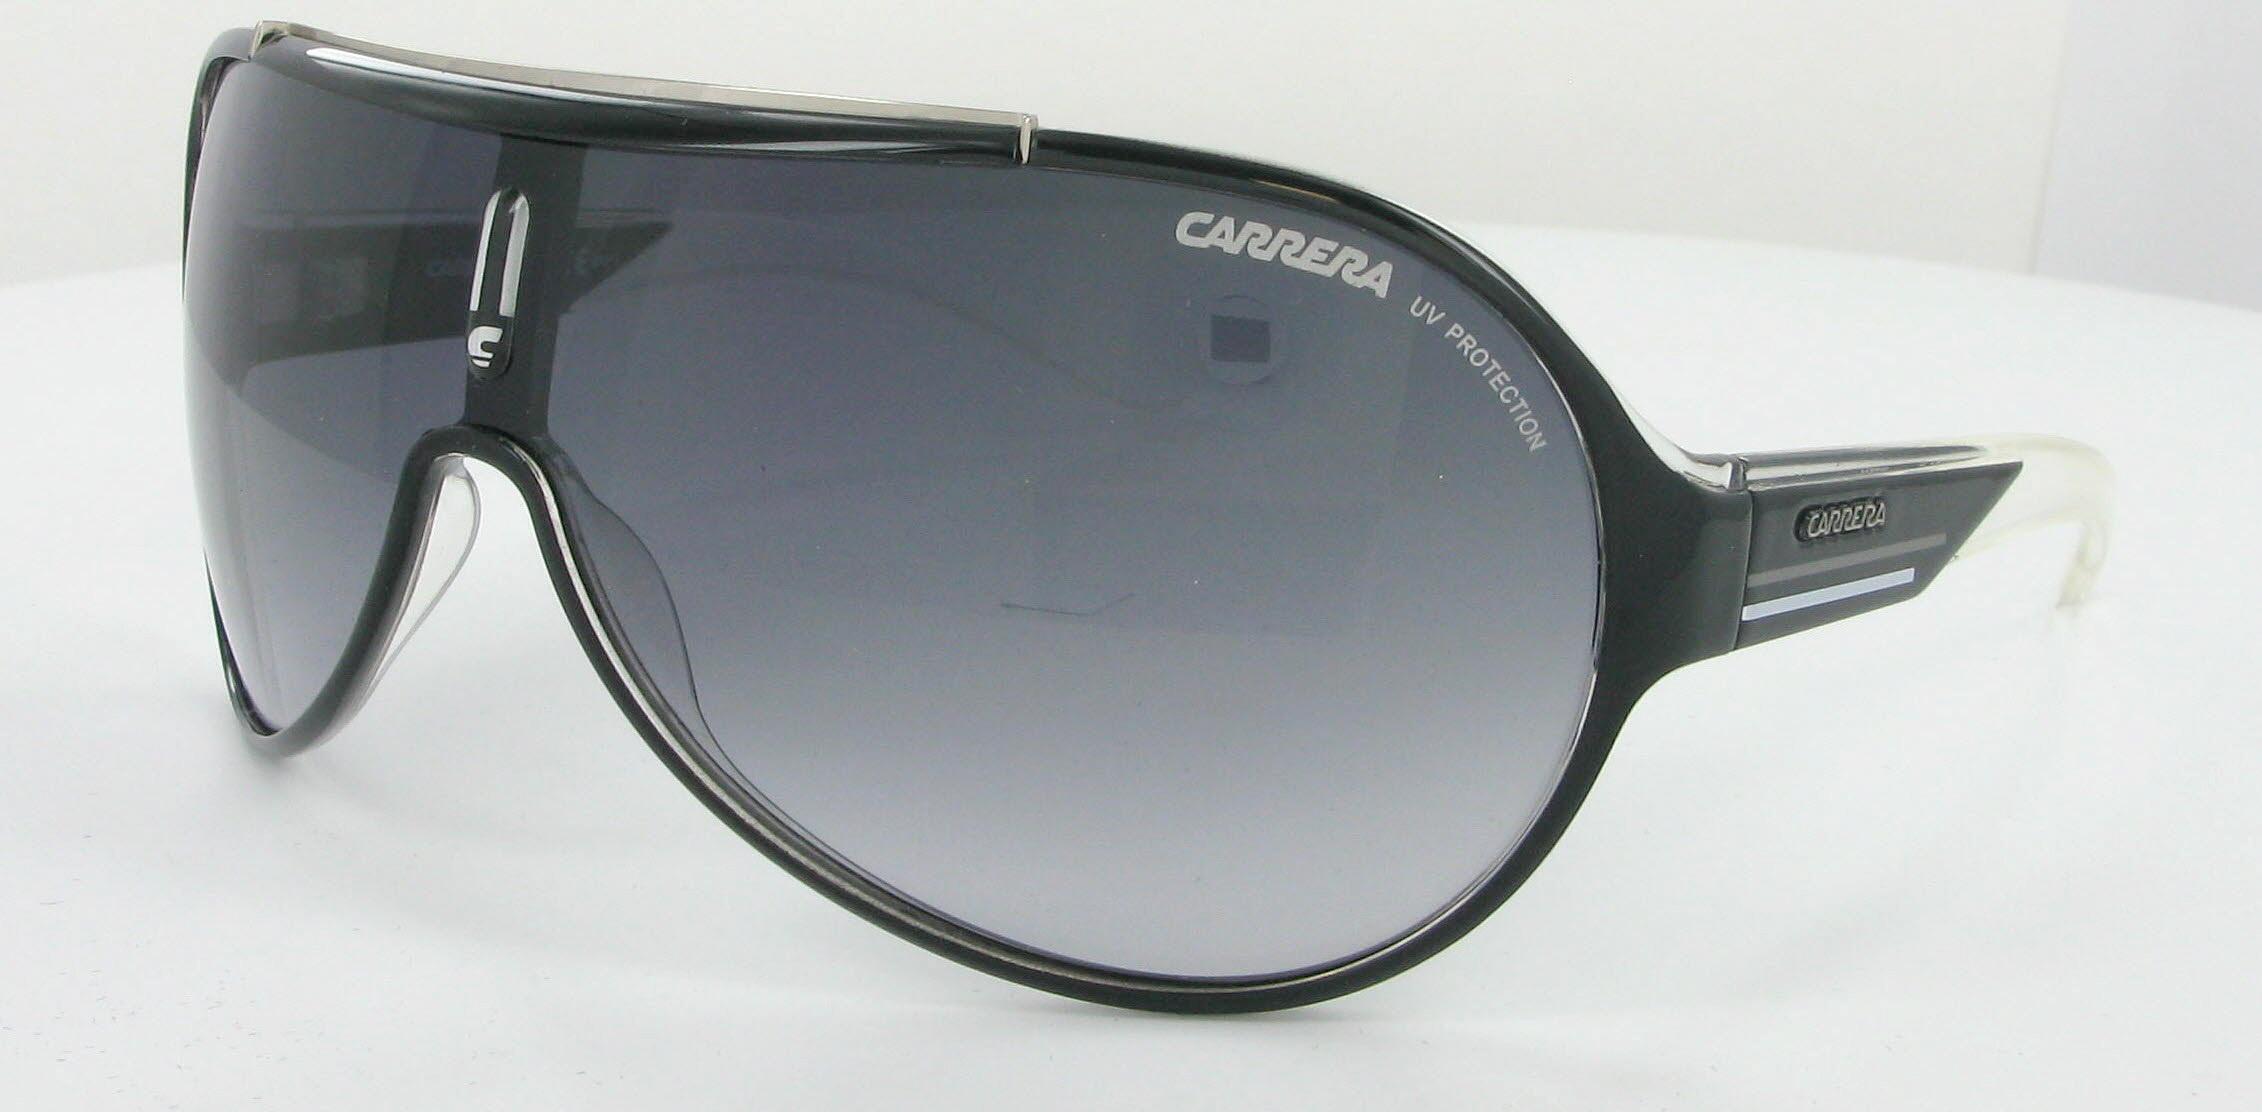 lunettes de soleil carrera homme 2011 louisiana bucket brigade. Black Bedroom Furniture Sets. Home Design Ideas